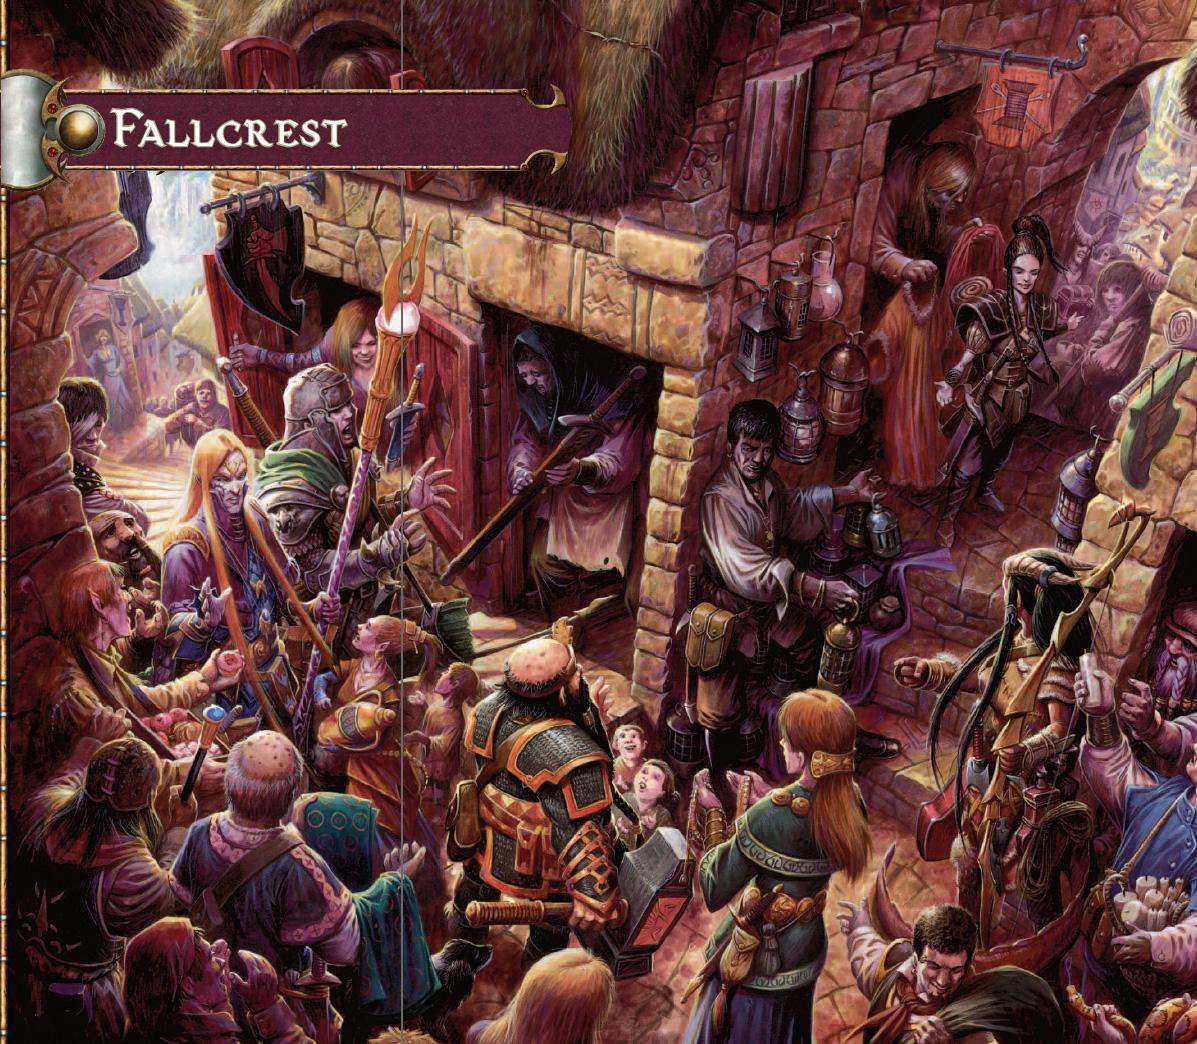 Town of fallcrest